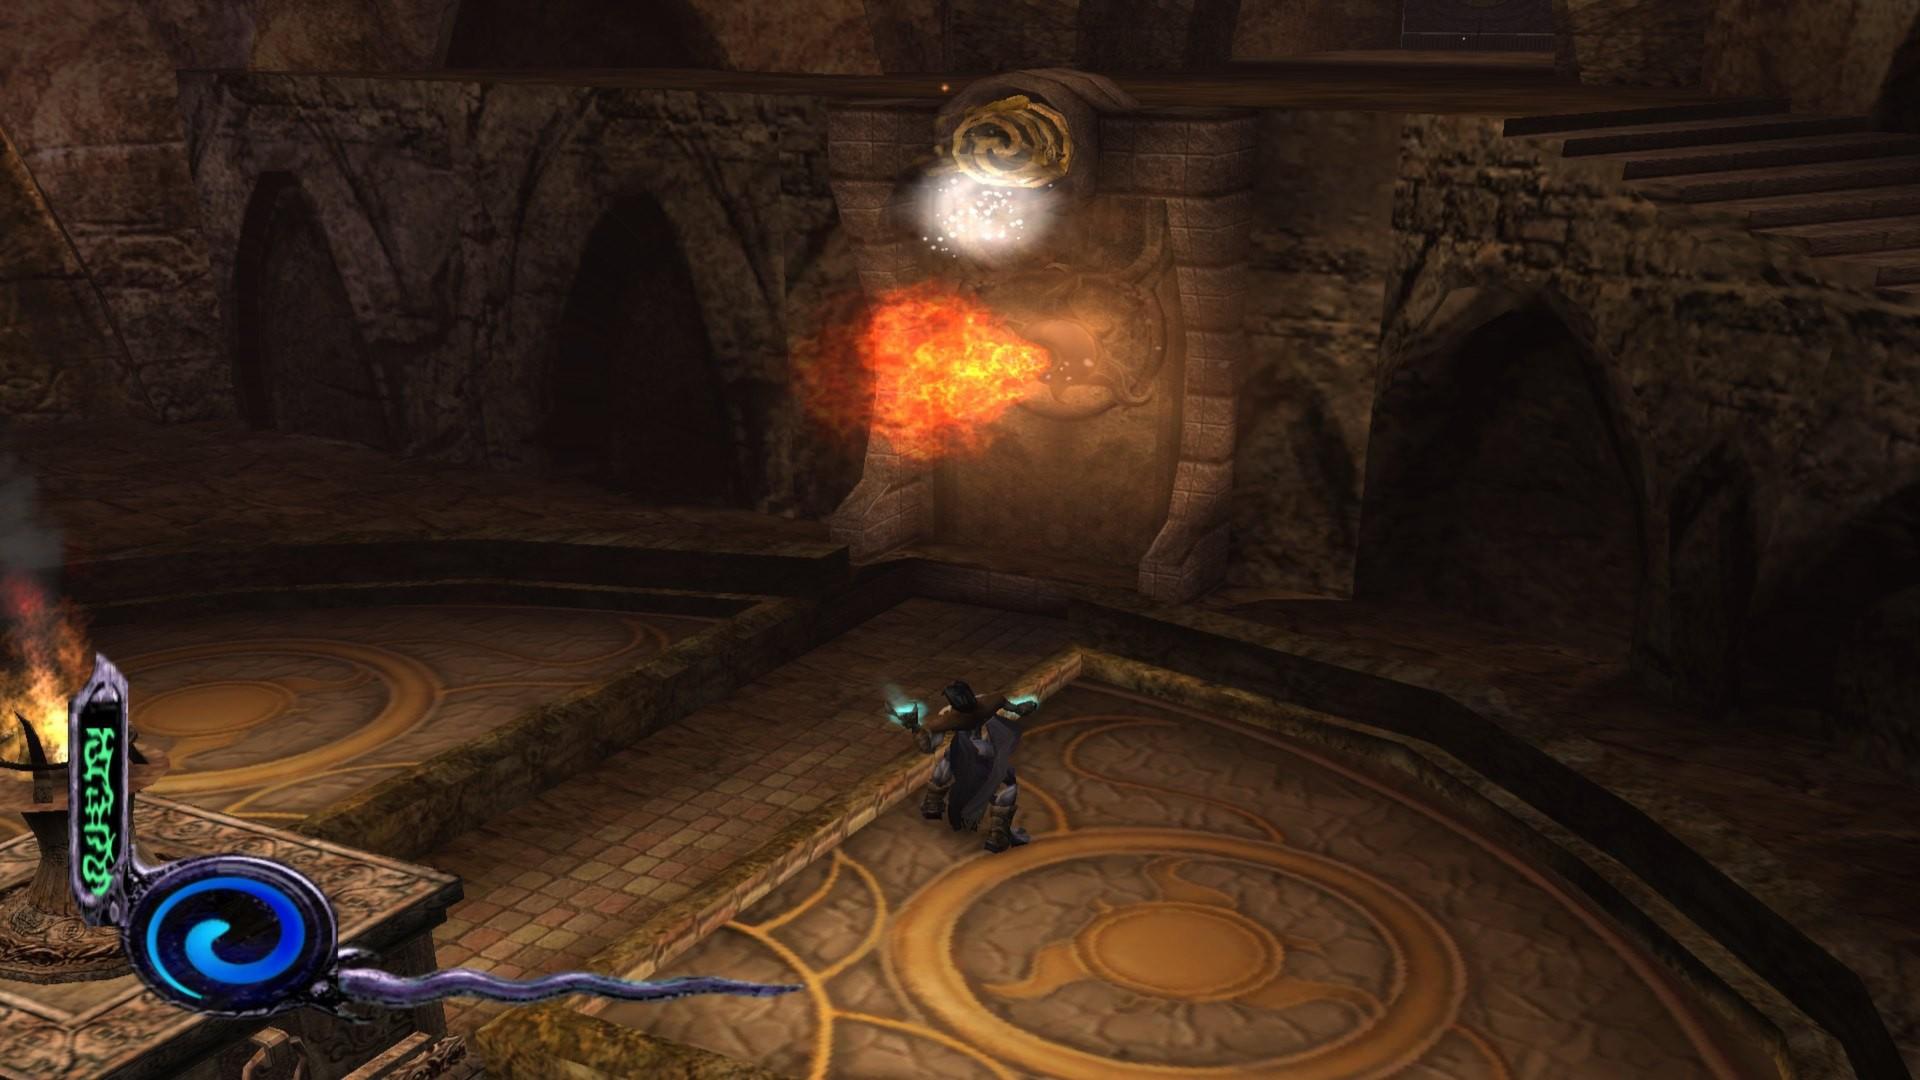 Legacy of Kain: Defiance screenshot 1